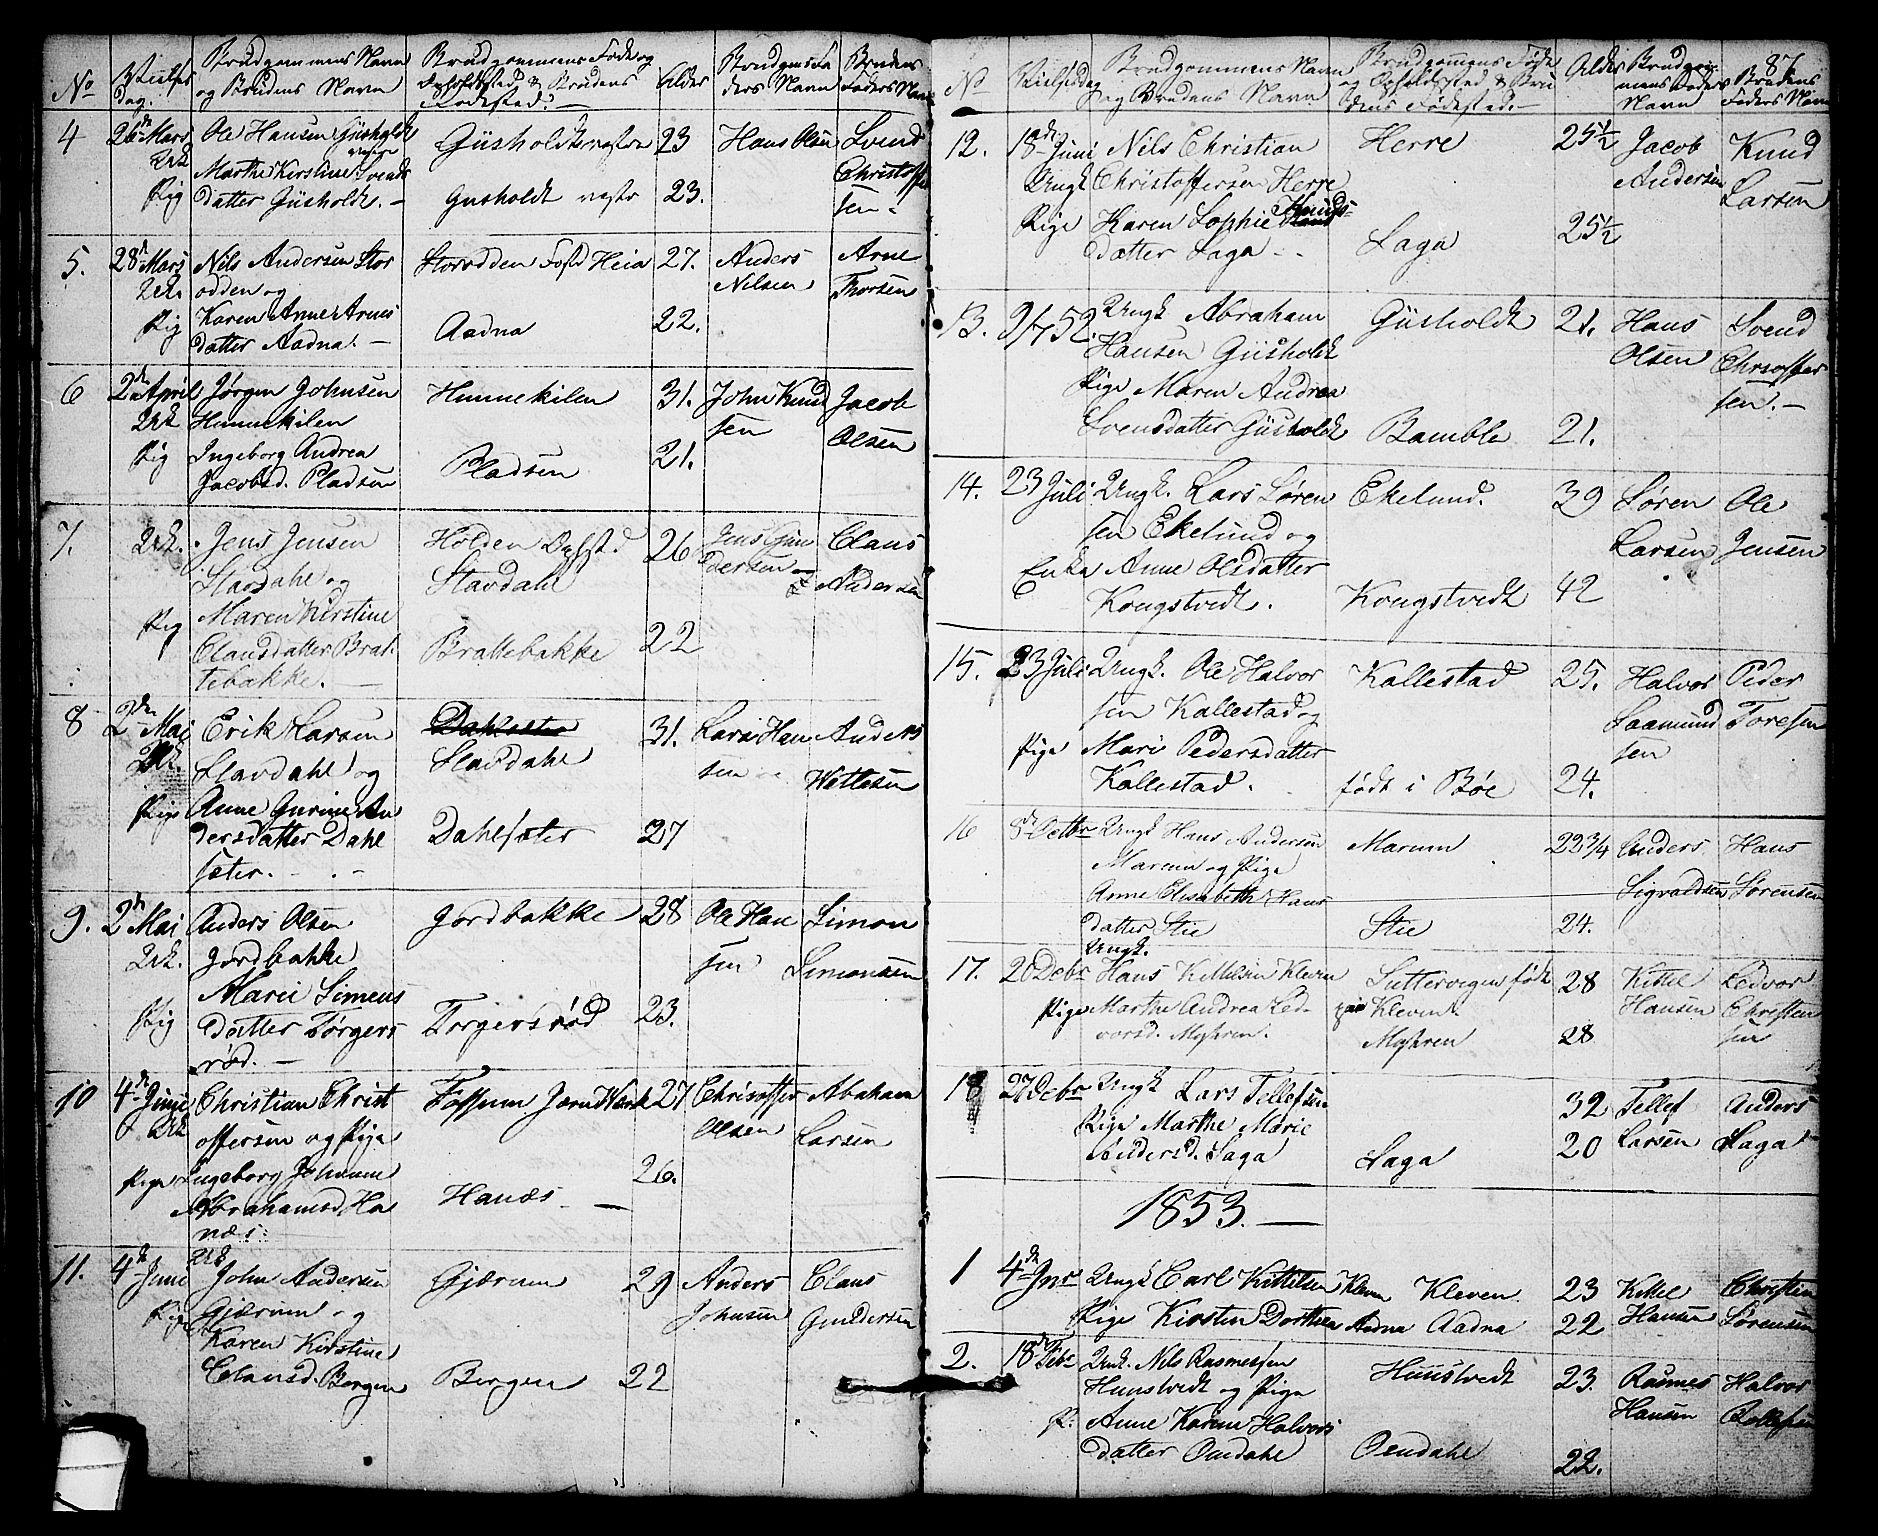 SAKO, Solum kirkebøker, G/Gb/L0001: Klokkerbok nr. II 1, 1848-1859, s. 87